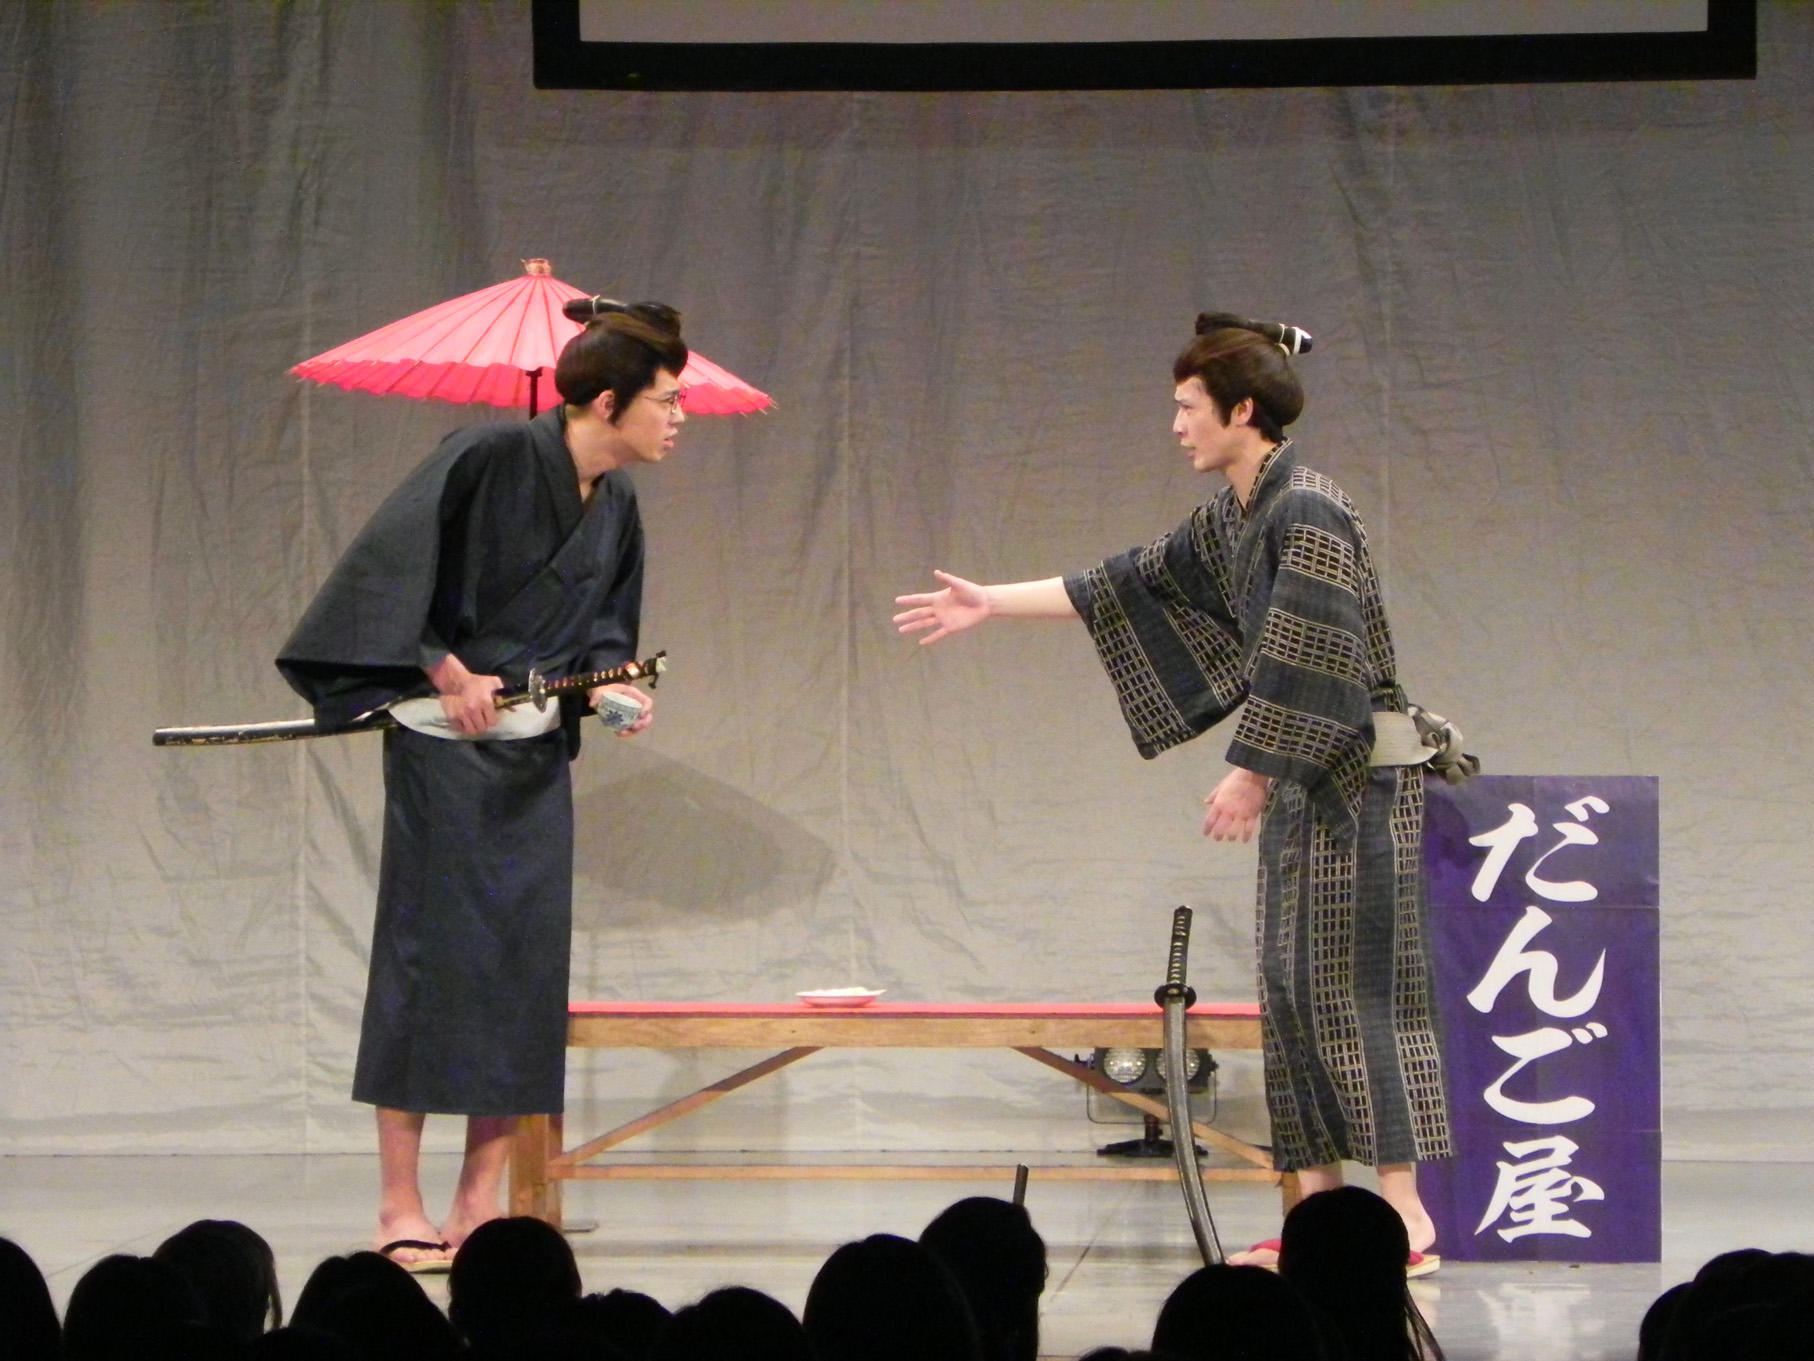 http://news.yoshimoto.co.jp/20170505220051-a1493b746abd196e445bb1911312c7e9560f9f33.jpg